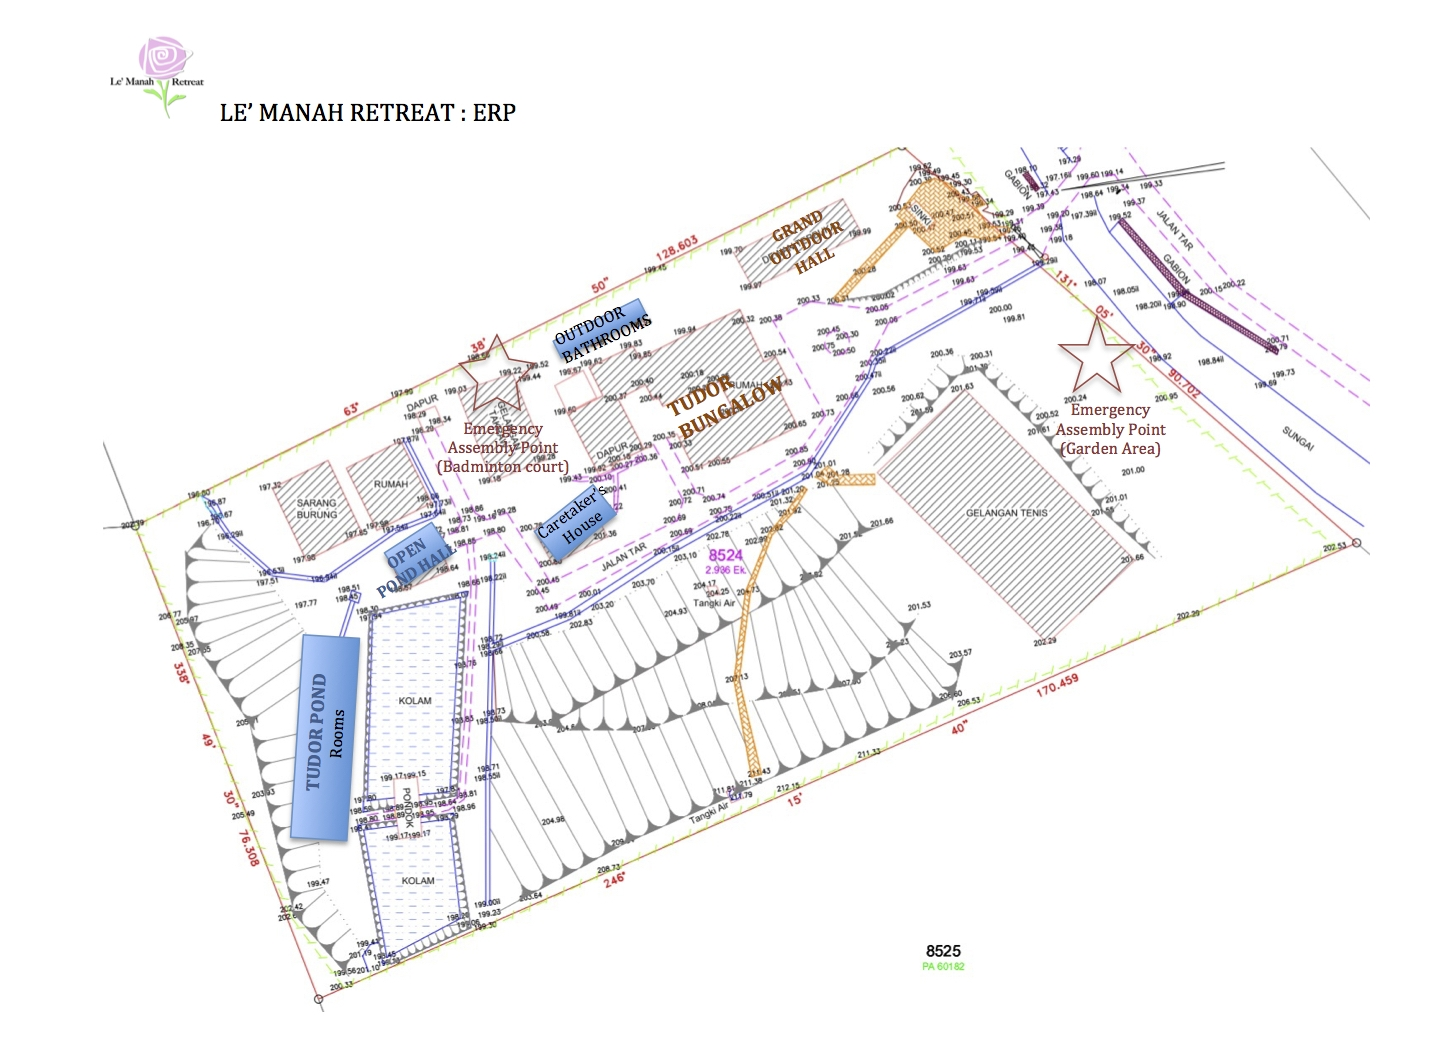 Le' Manah Retreat Emergency Response Plan (ERP)